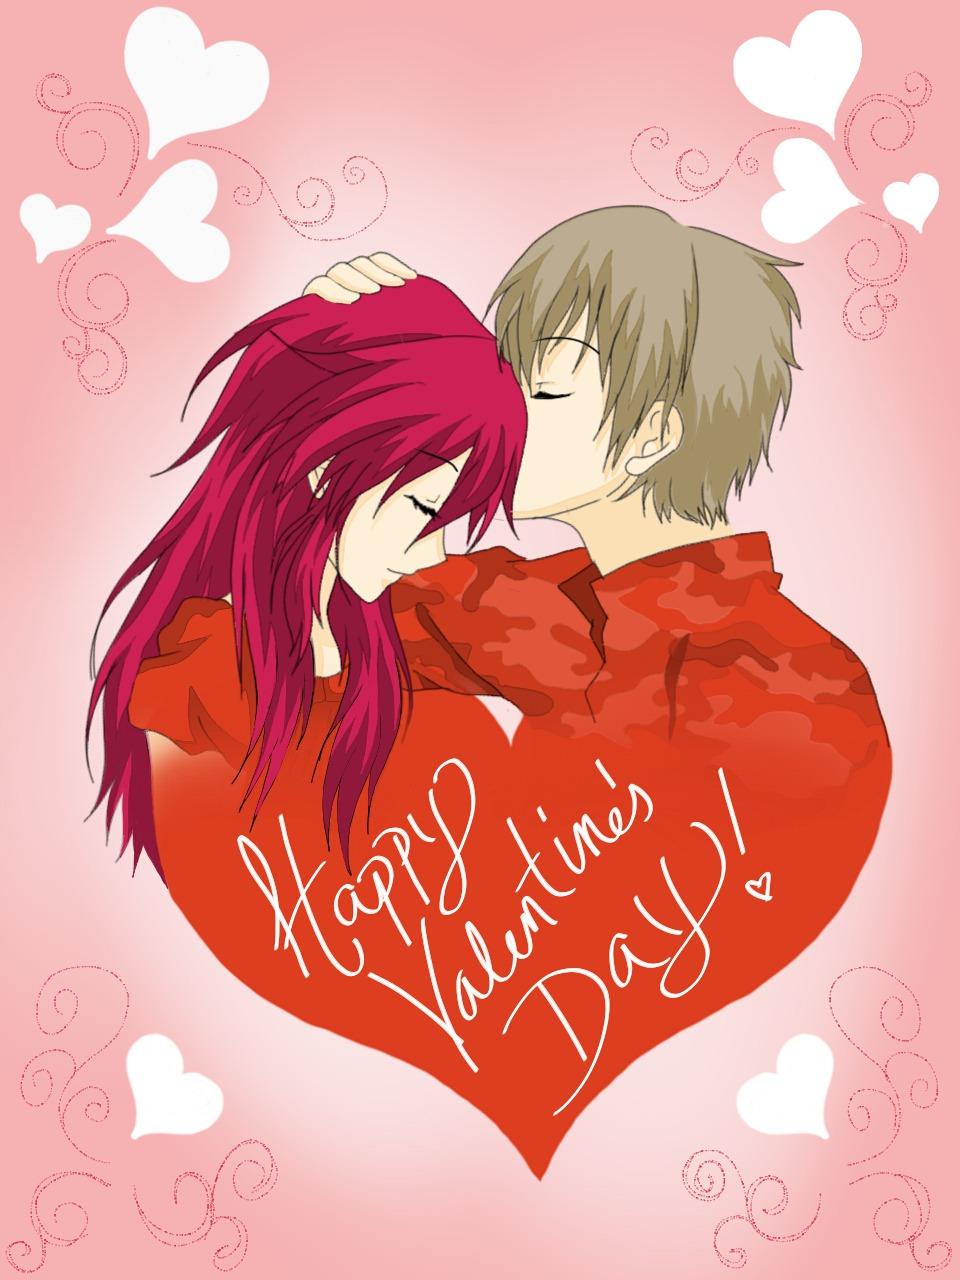 Happy Valentines Day By InaSaori Happy Valentines Day By InaSaori